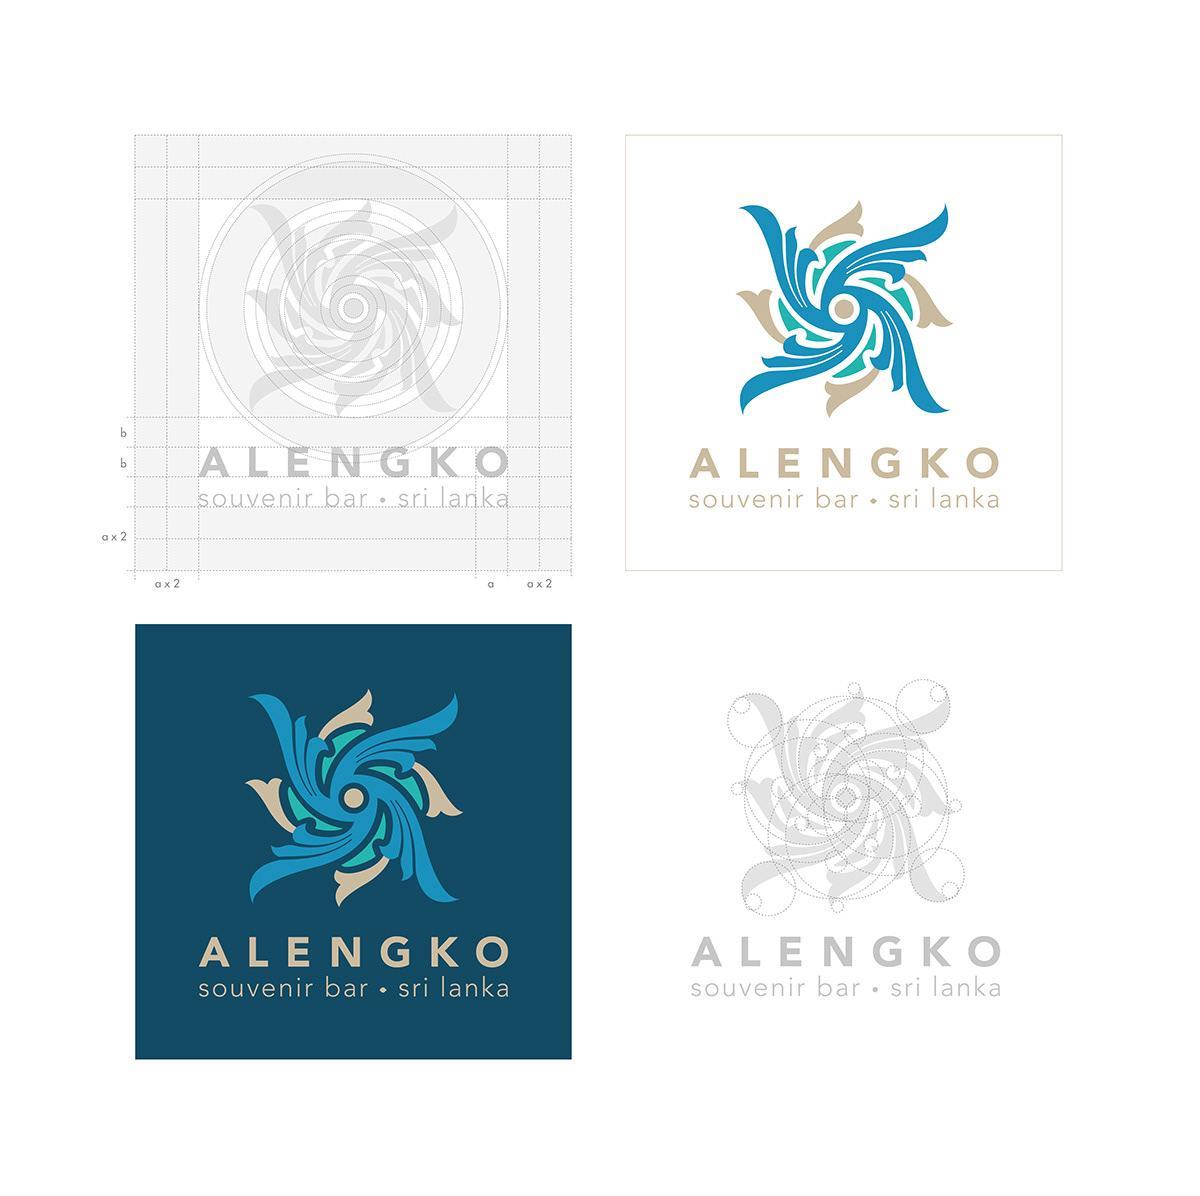 Alengko colombo Sri lanka branding  Graphic Designer Packaging ravana Yaka Mask rakshasa Yaksha